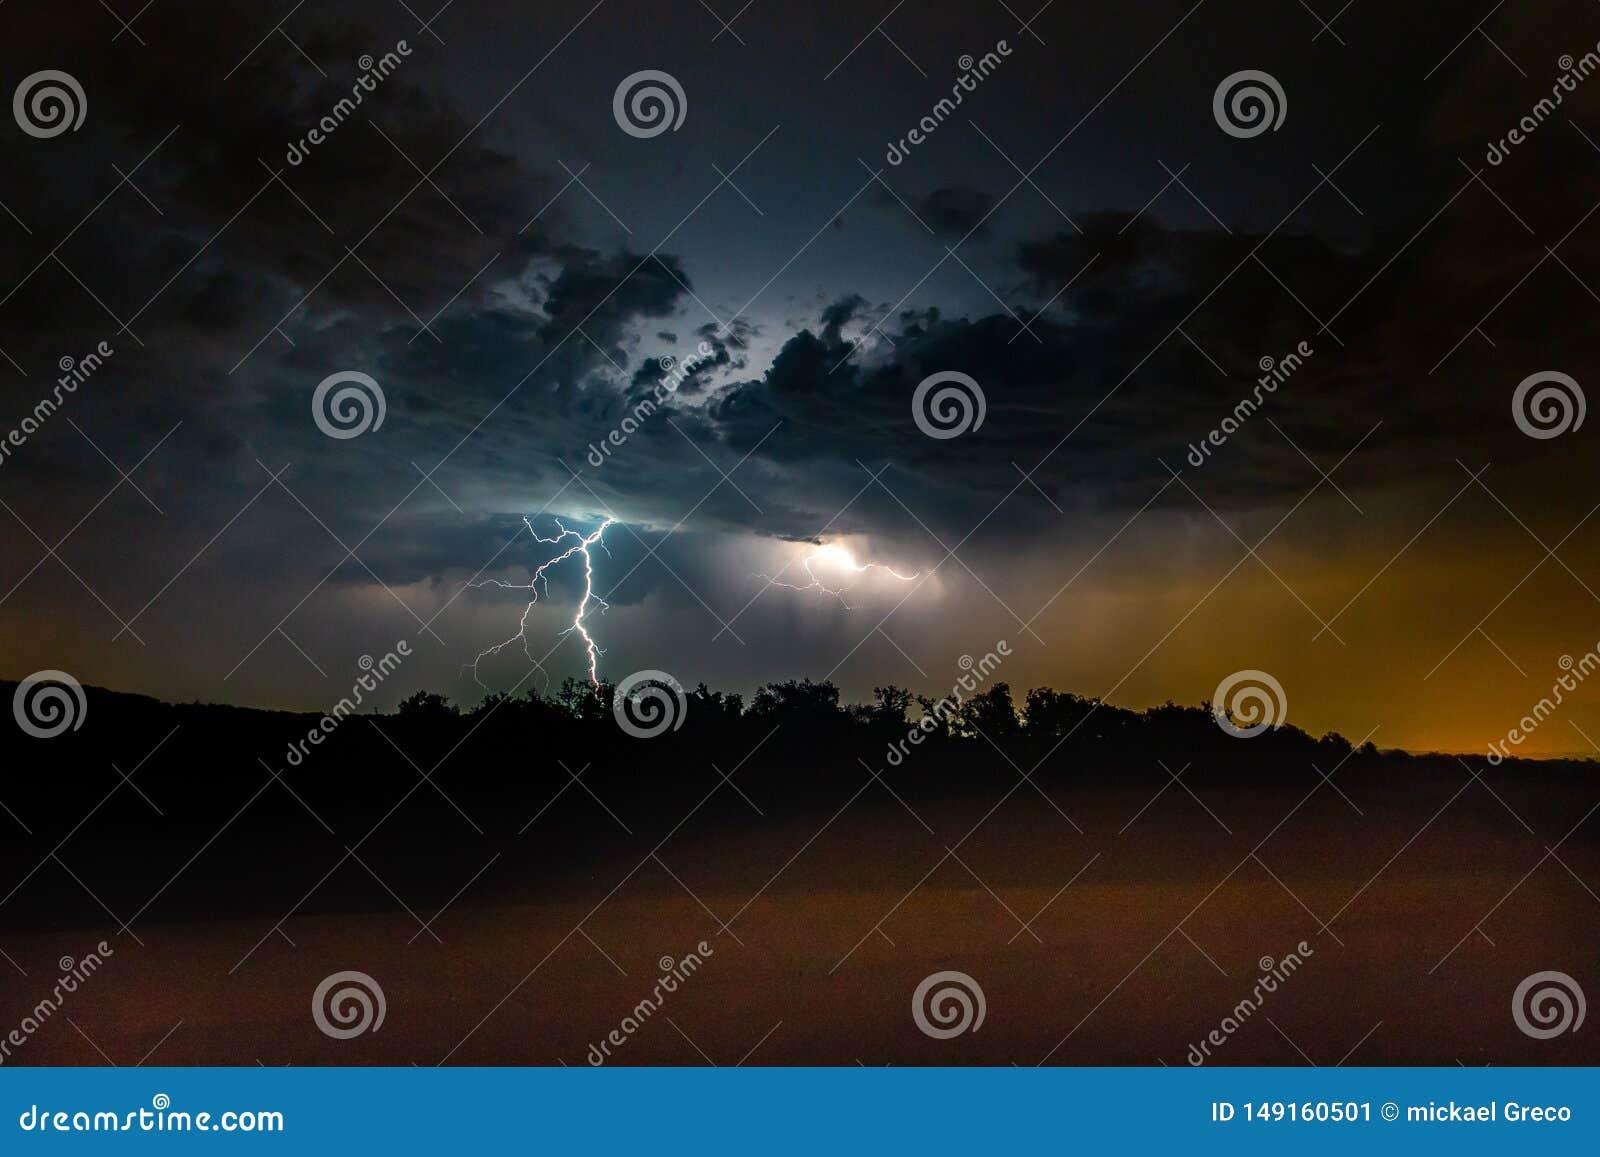 Thunderlights